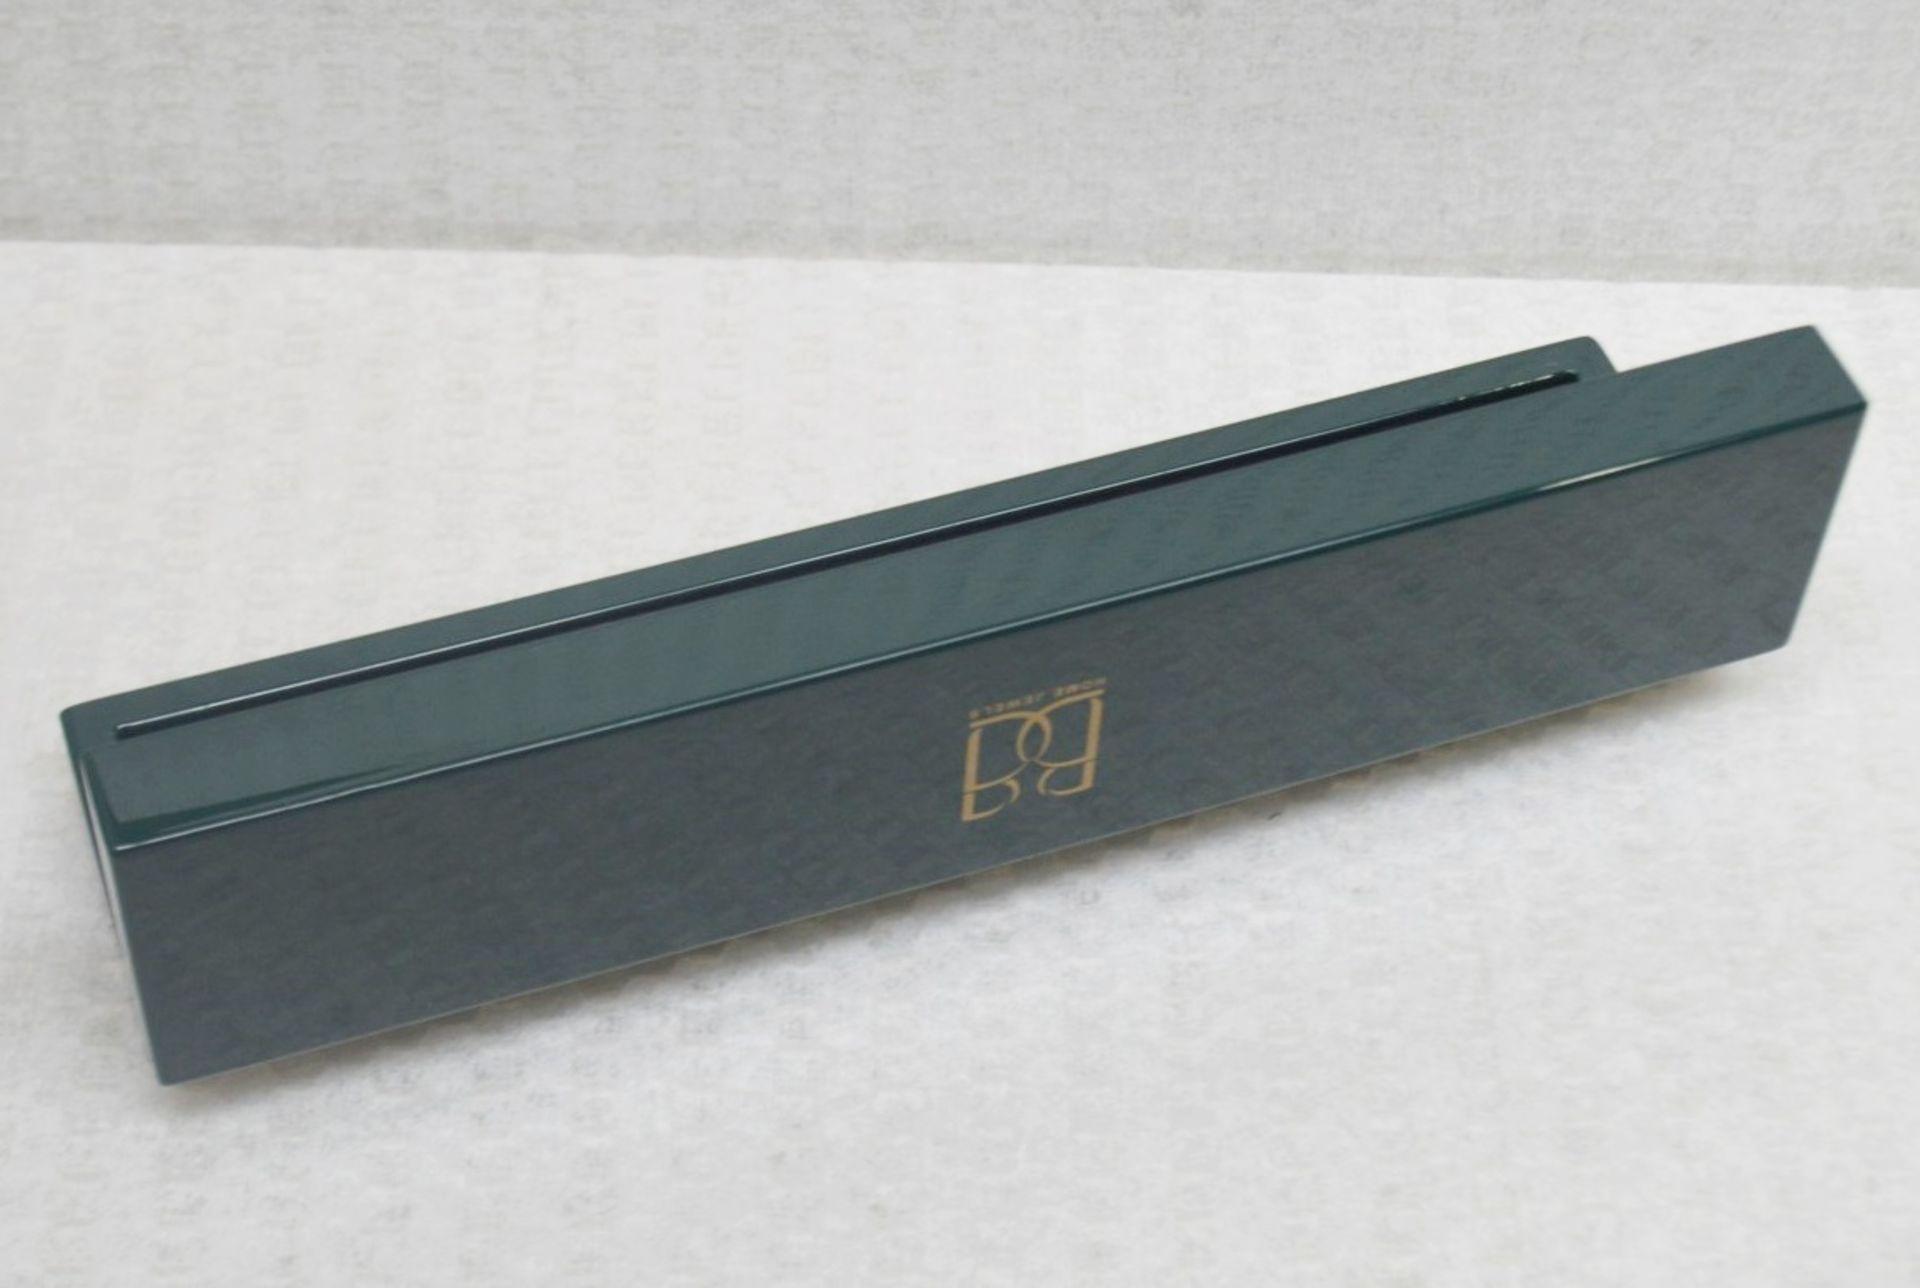 1 x BALDI 'Home Jewels' Italian Hand-crafted Artisan MISBAHA Prayer Beads In Amazonite Gemstone - Image 7 of 7